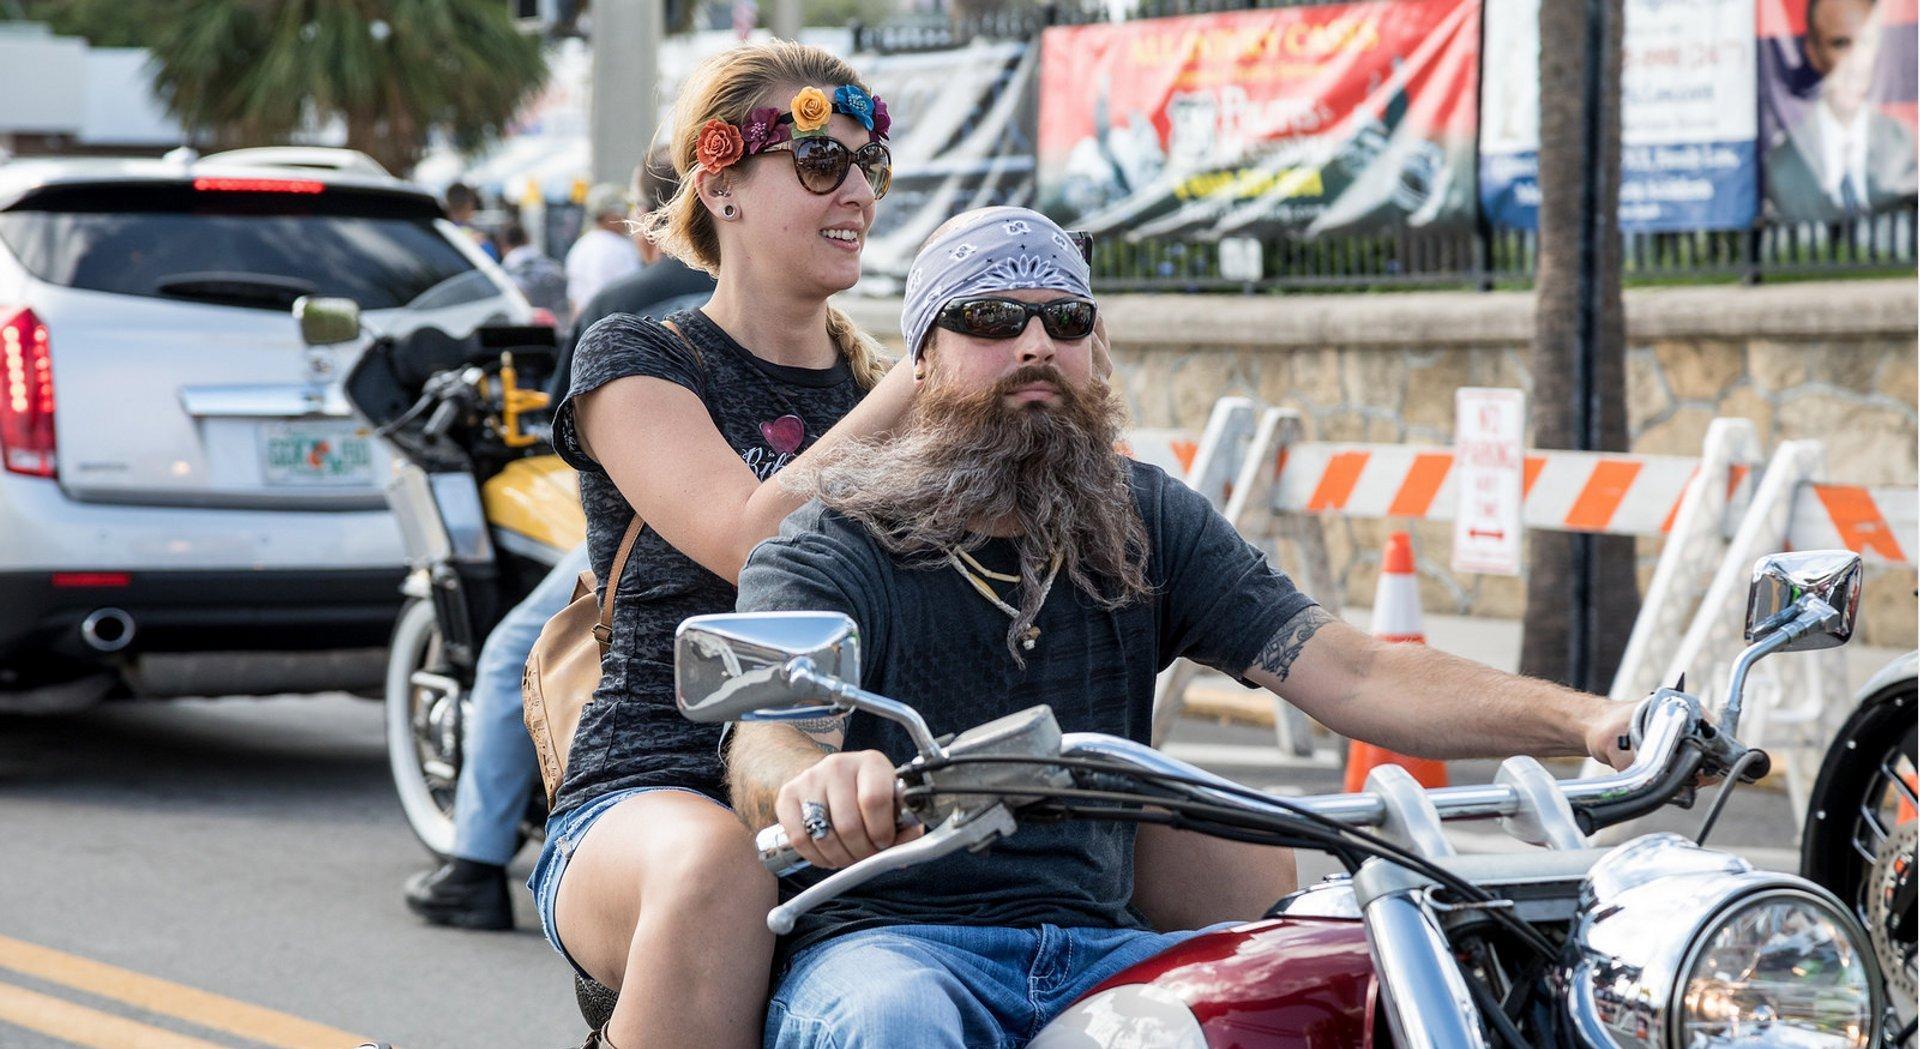 Best time for Daytona Beach Bike Week 2020